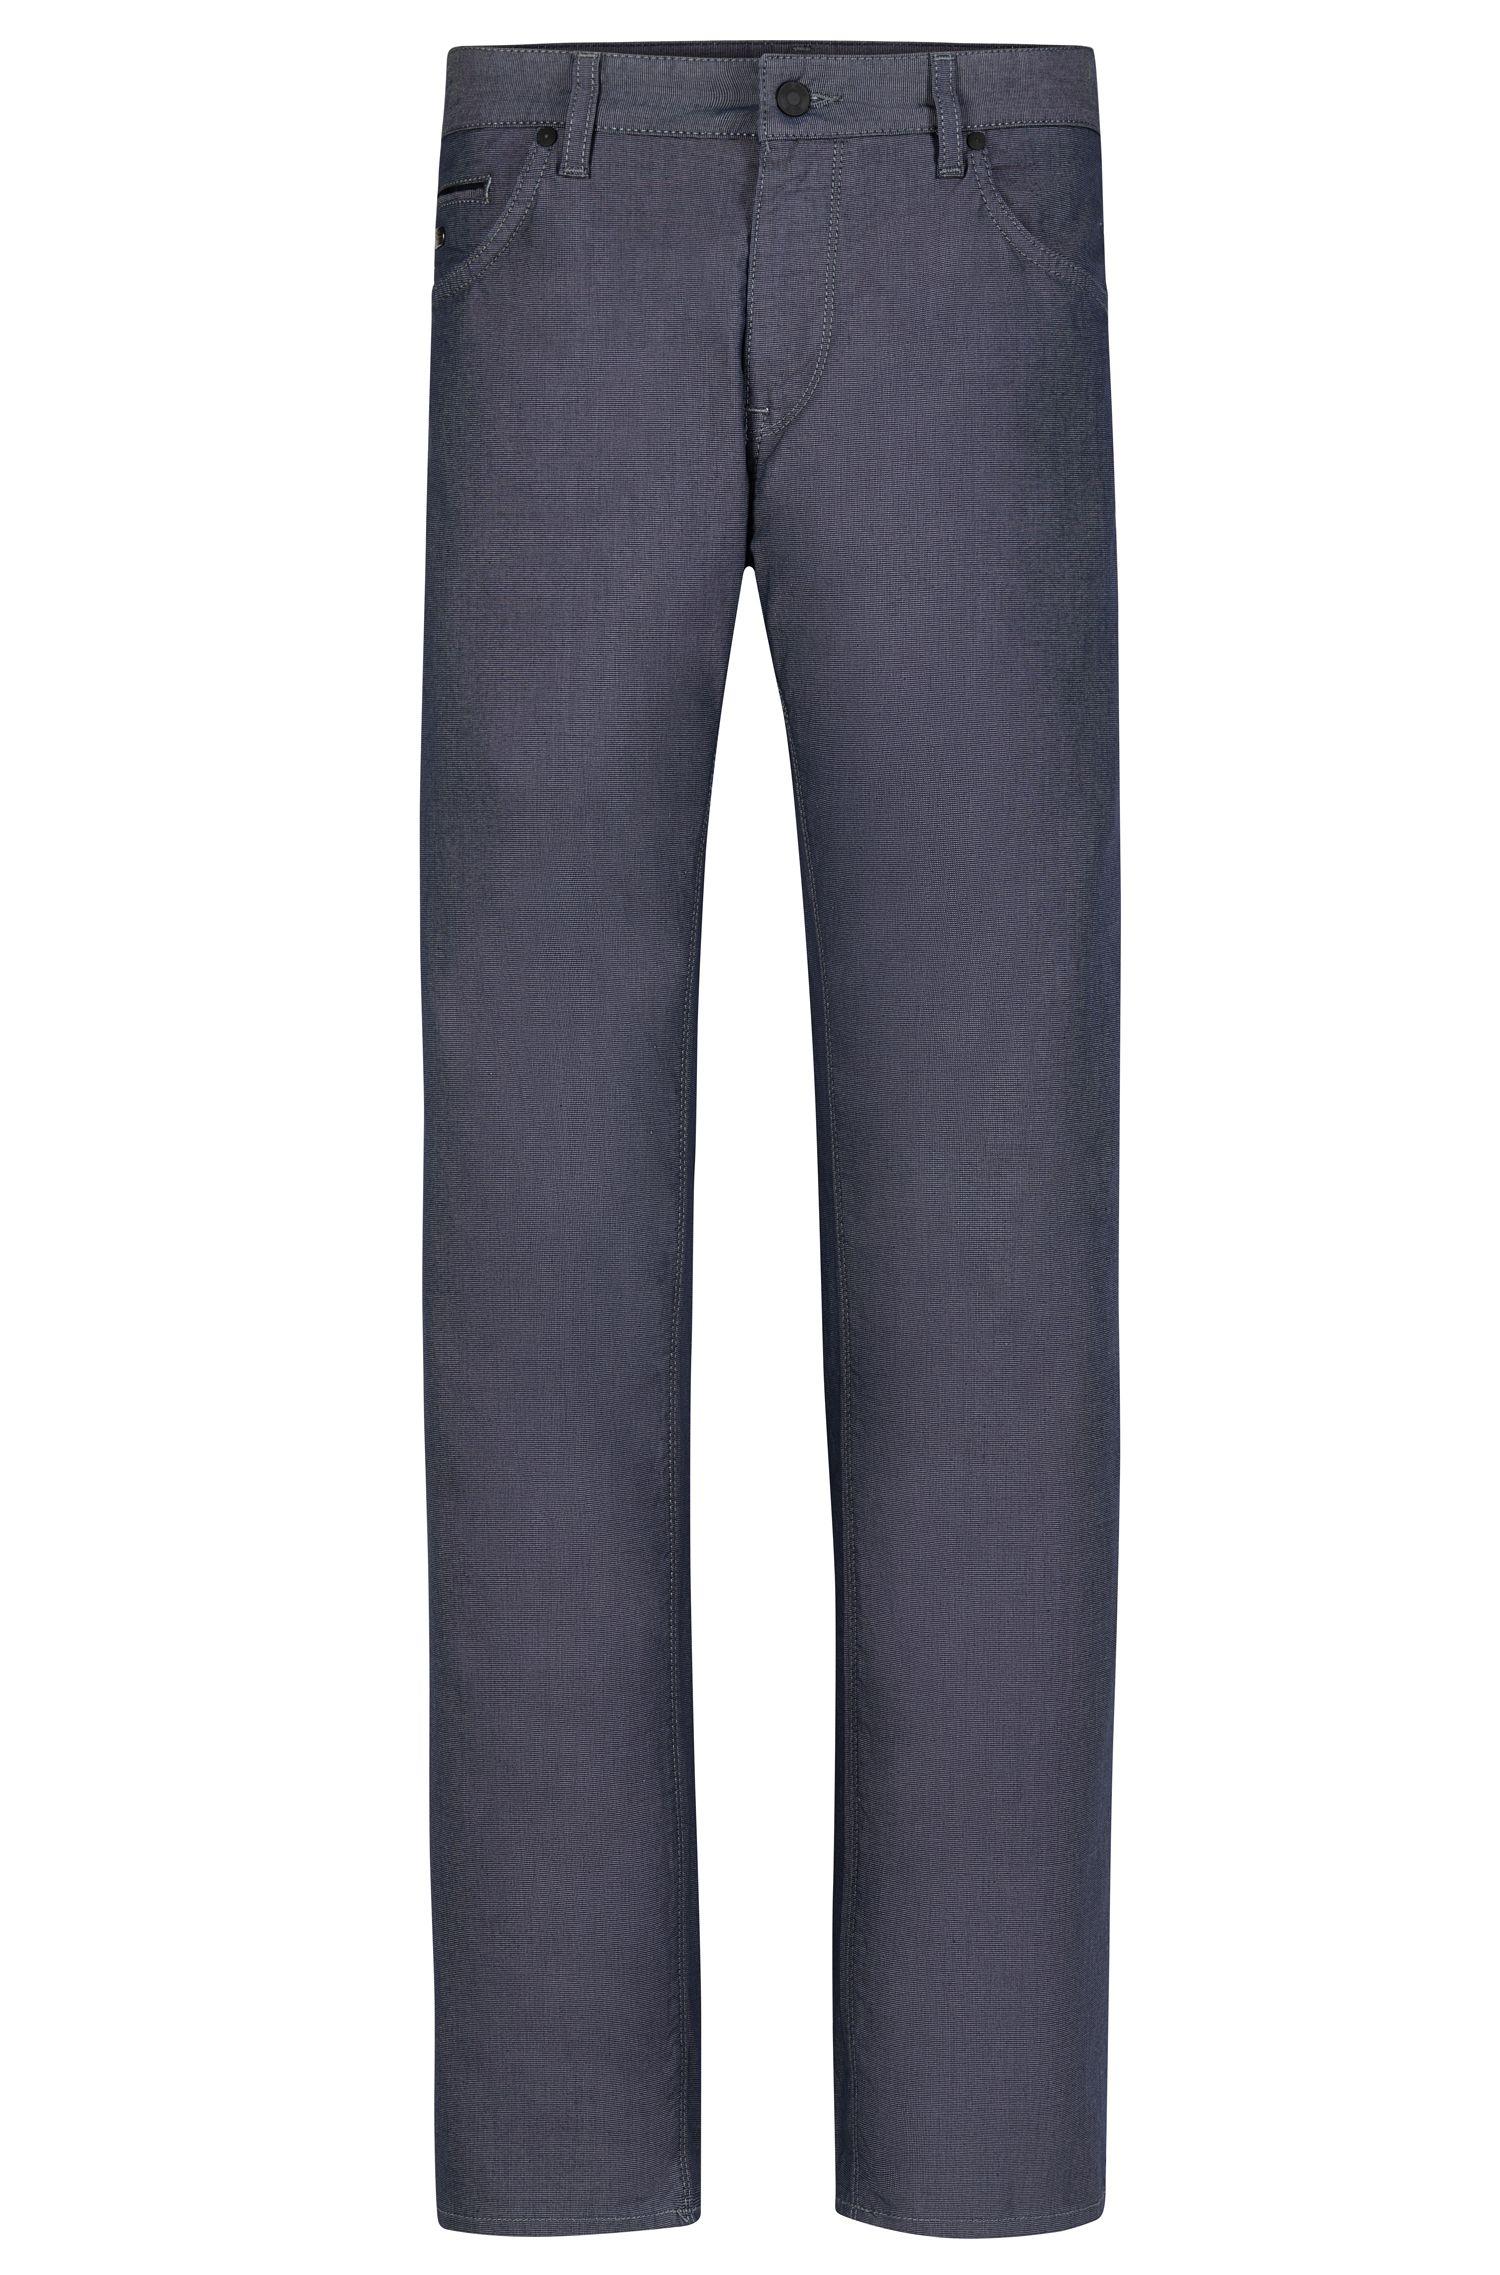 10 oz Stretch Cotton Blend Jeans, Regular Fit | C-Maine